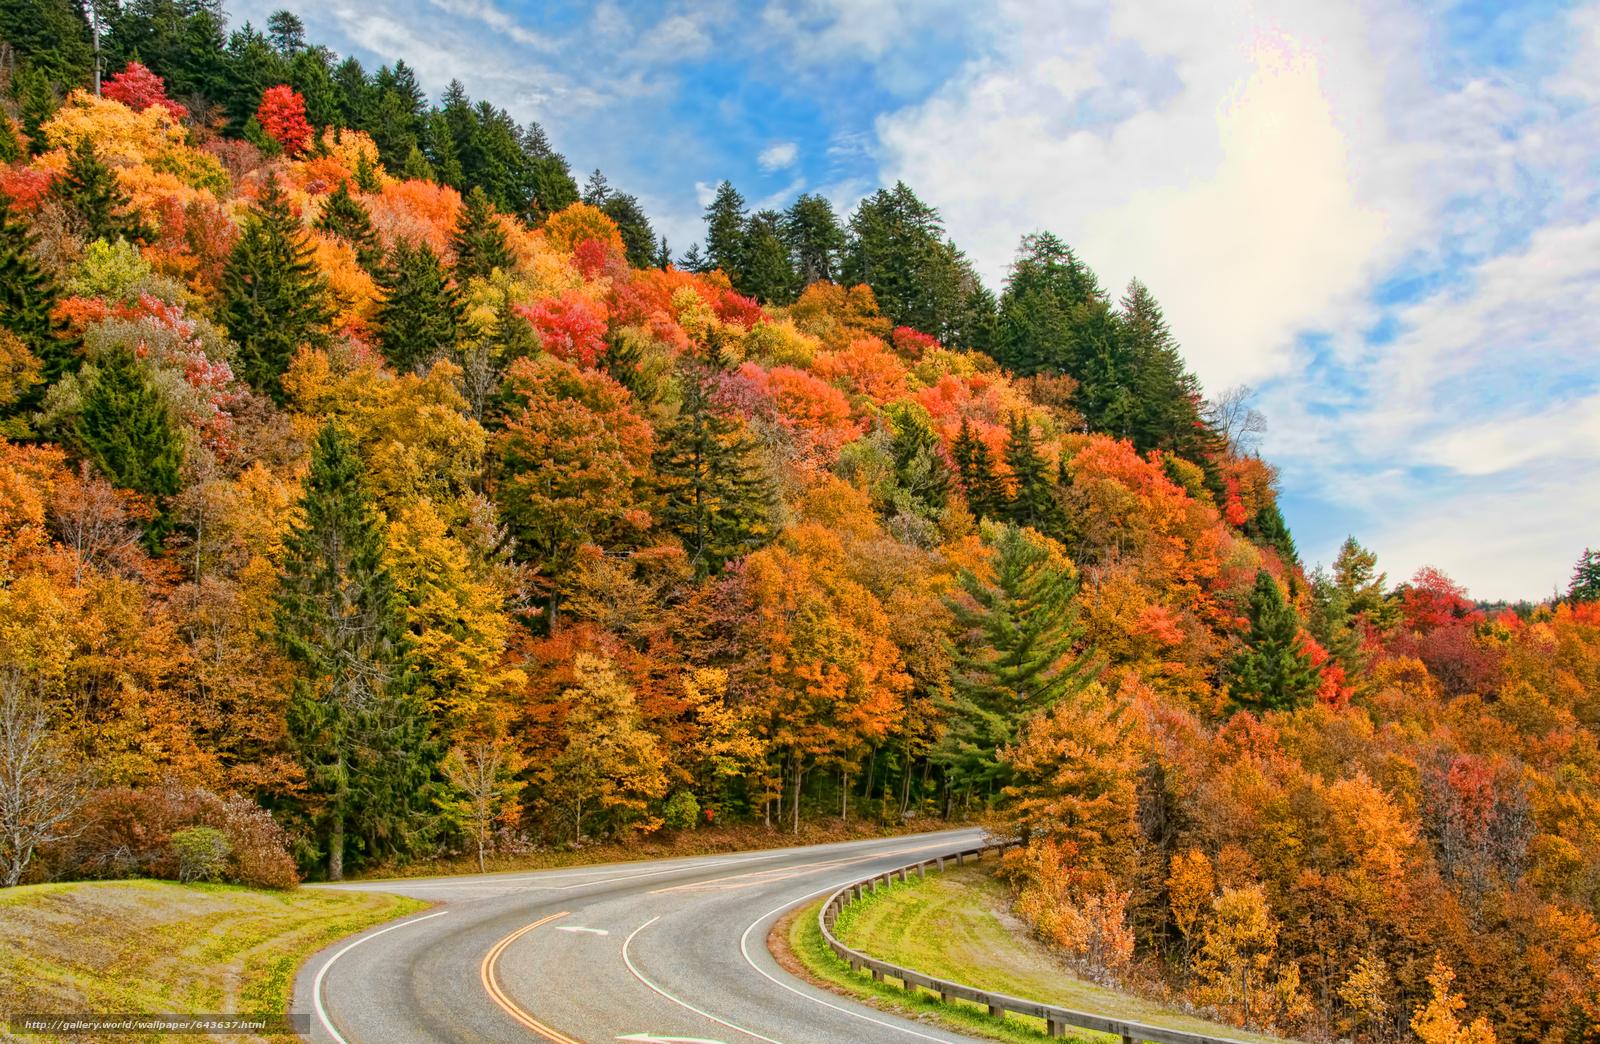 Download Wallpaper Smoky Mountain National Park Autumn